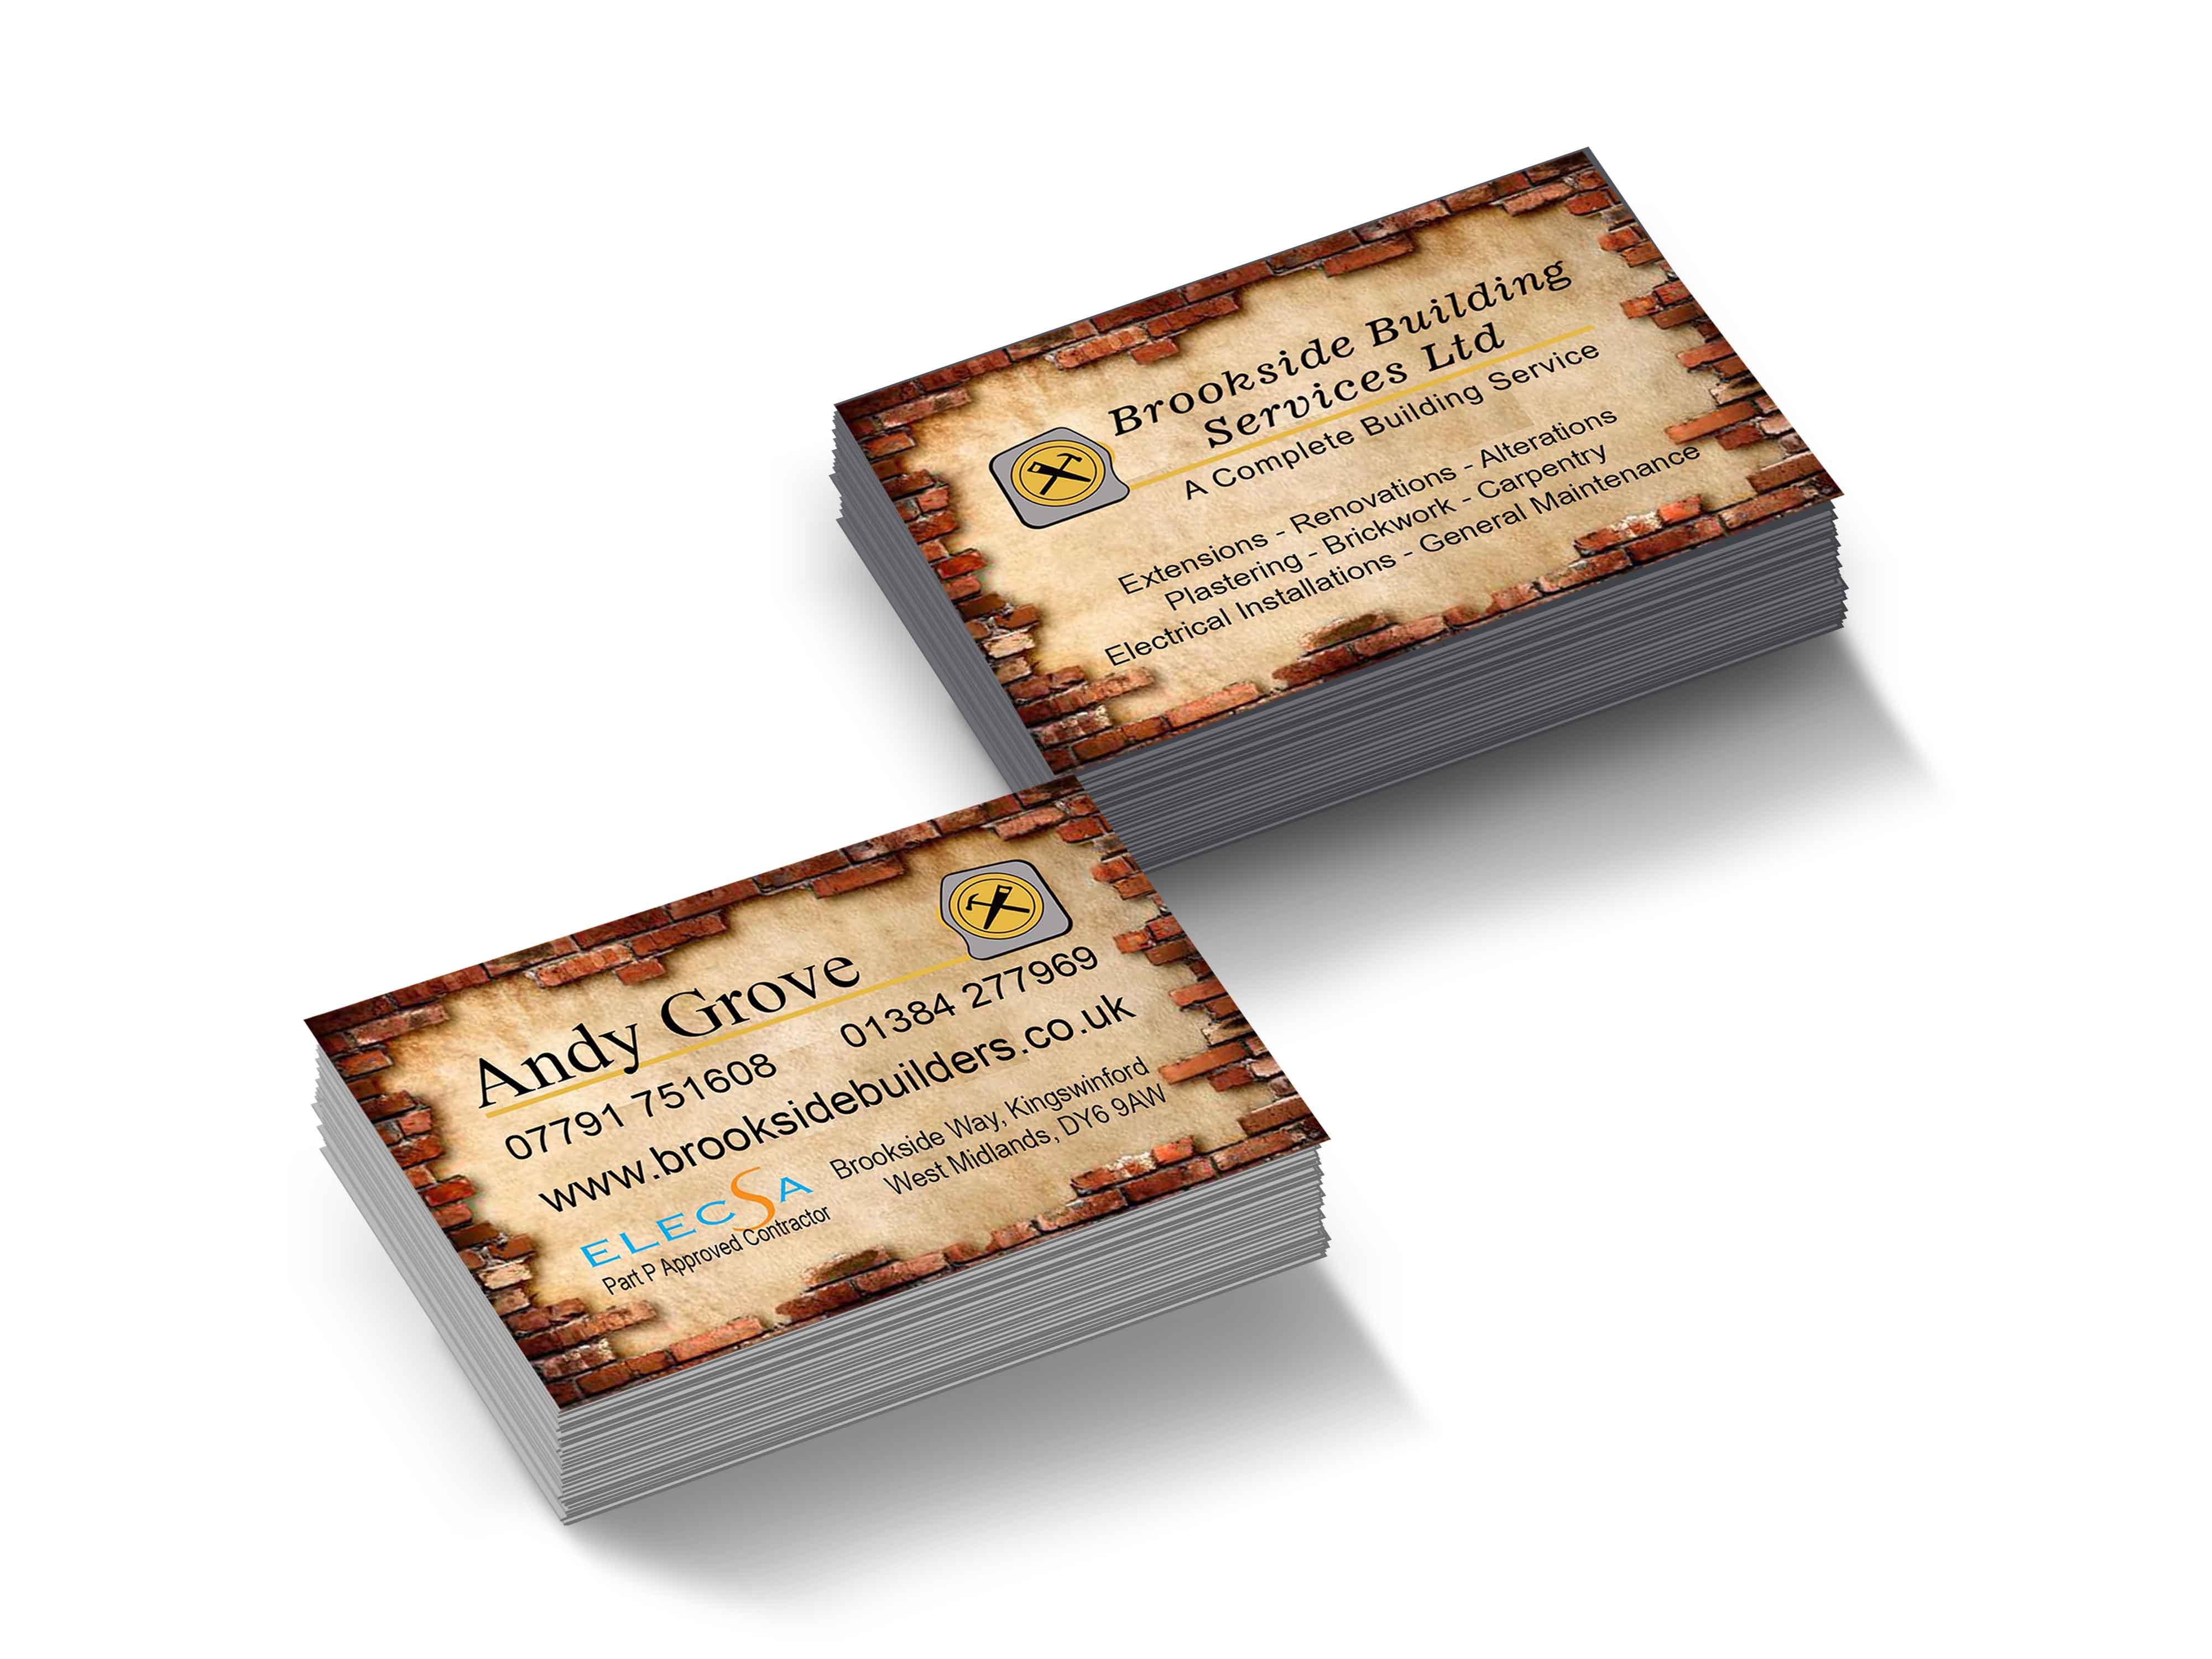 Brookside Builders Business Cards